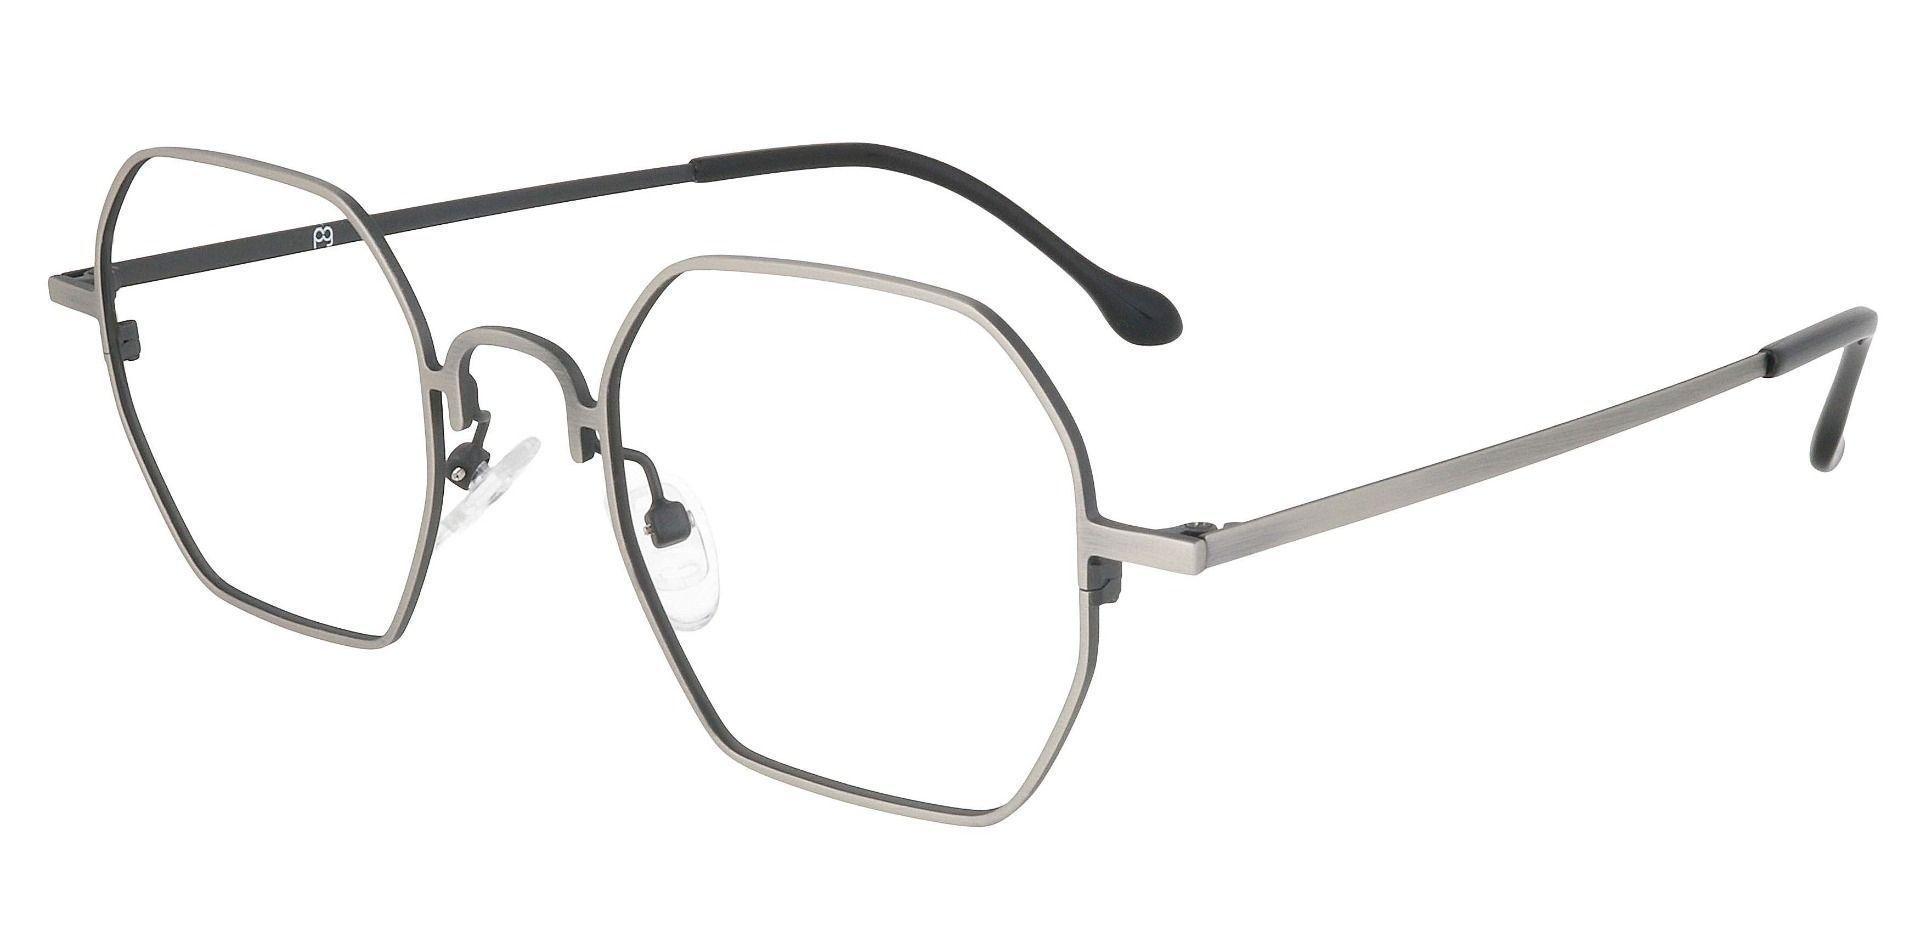 Easton Geometric Prescription Glasses - White